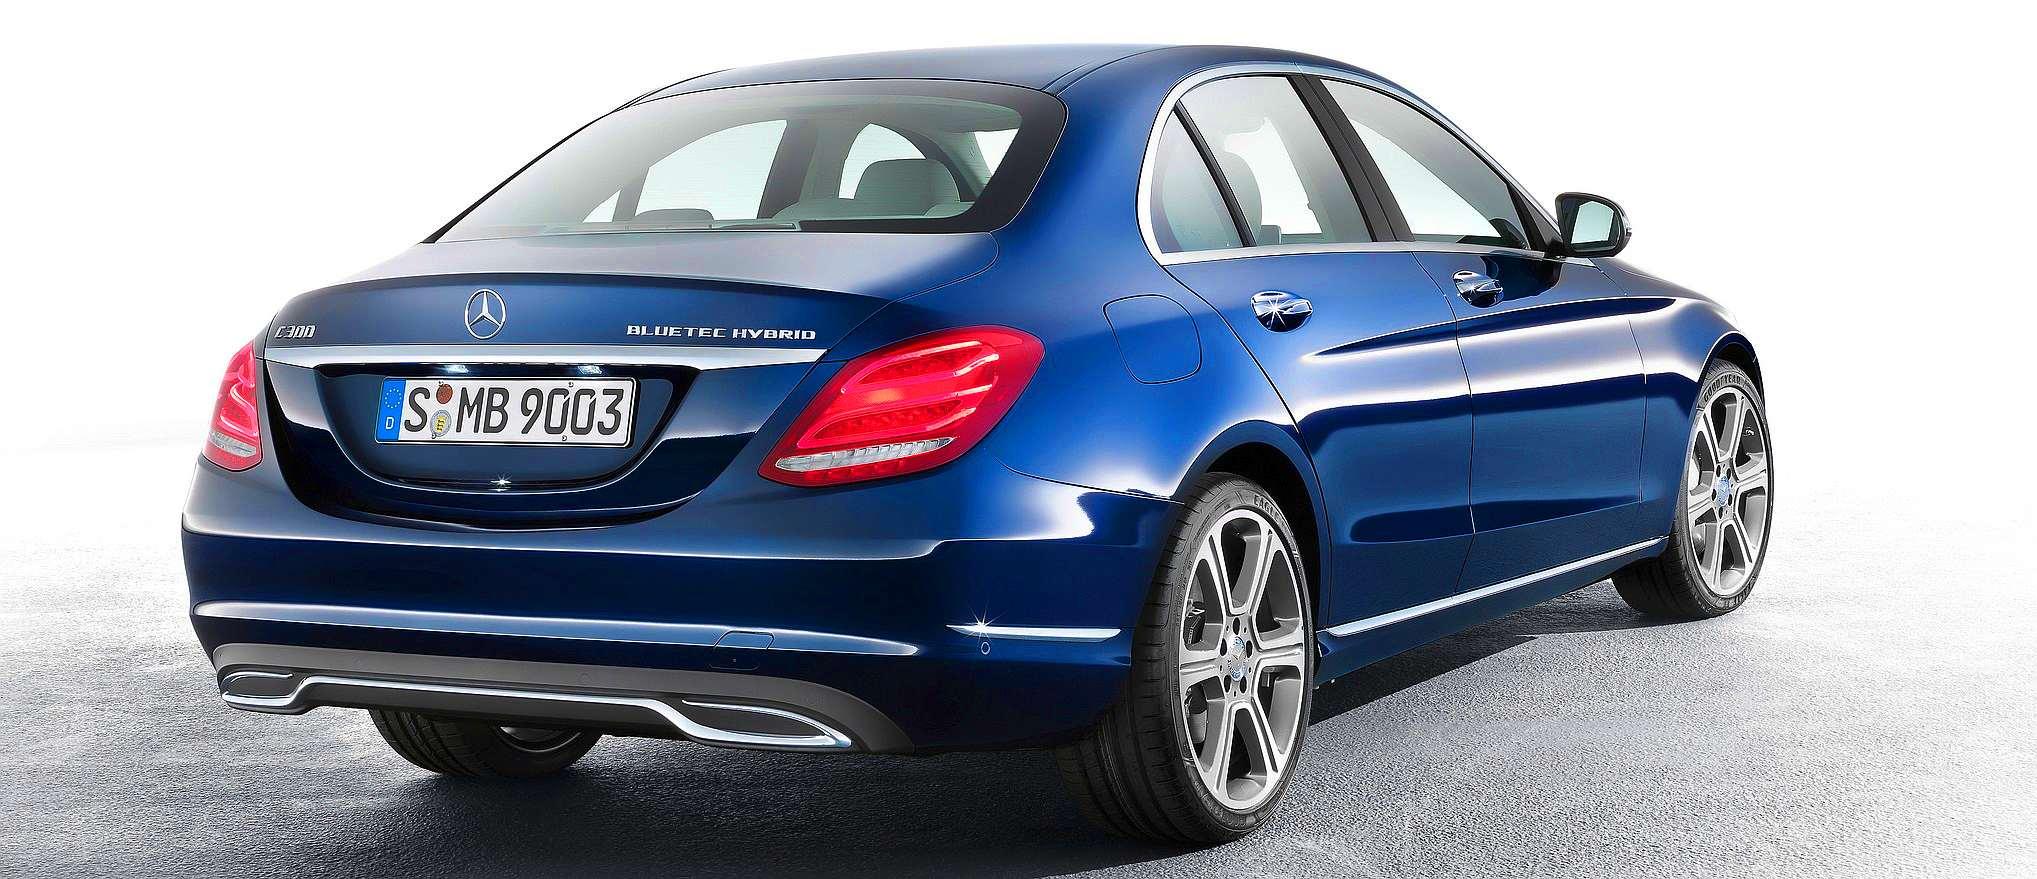 Mercedes-Benz C-class W205